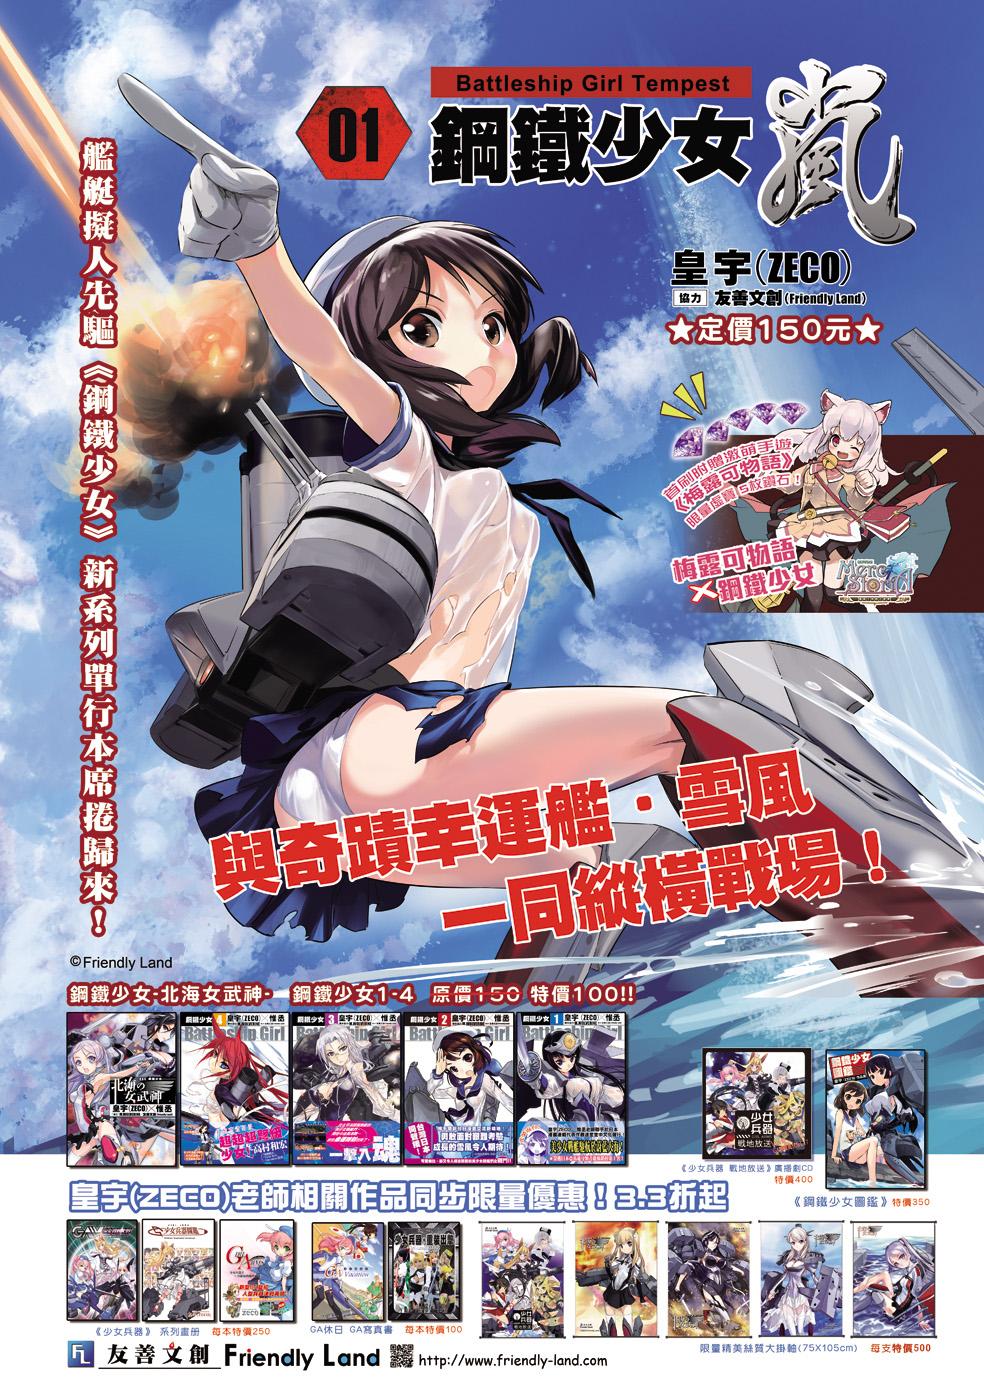 poster_arashi01.jpg